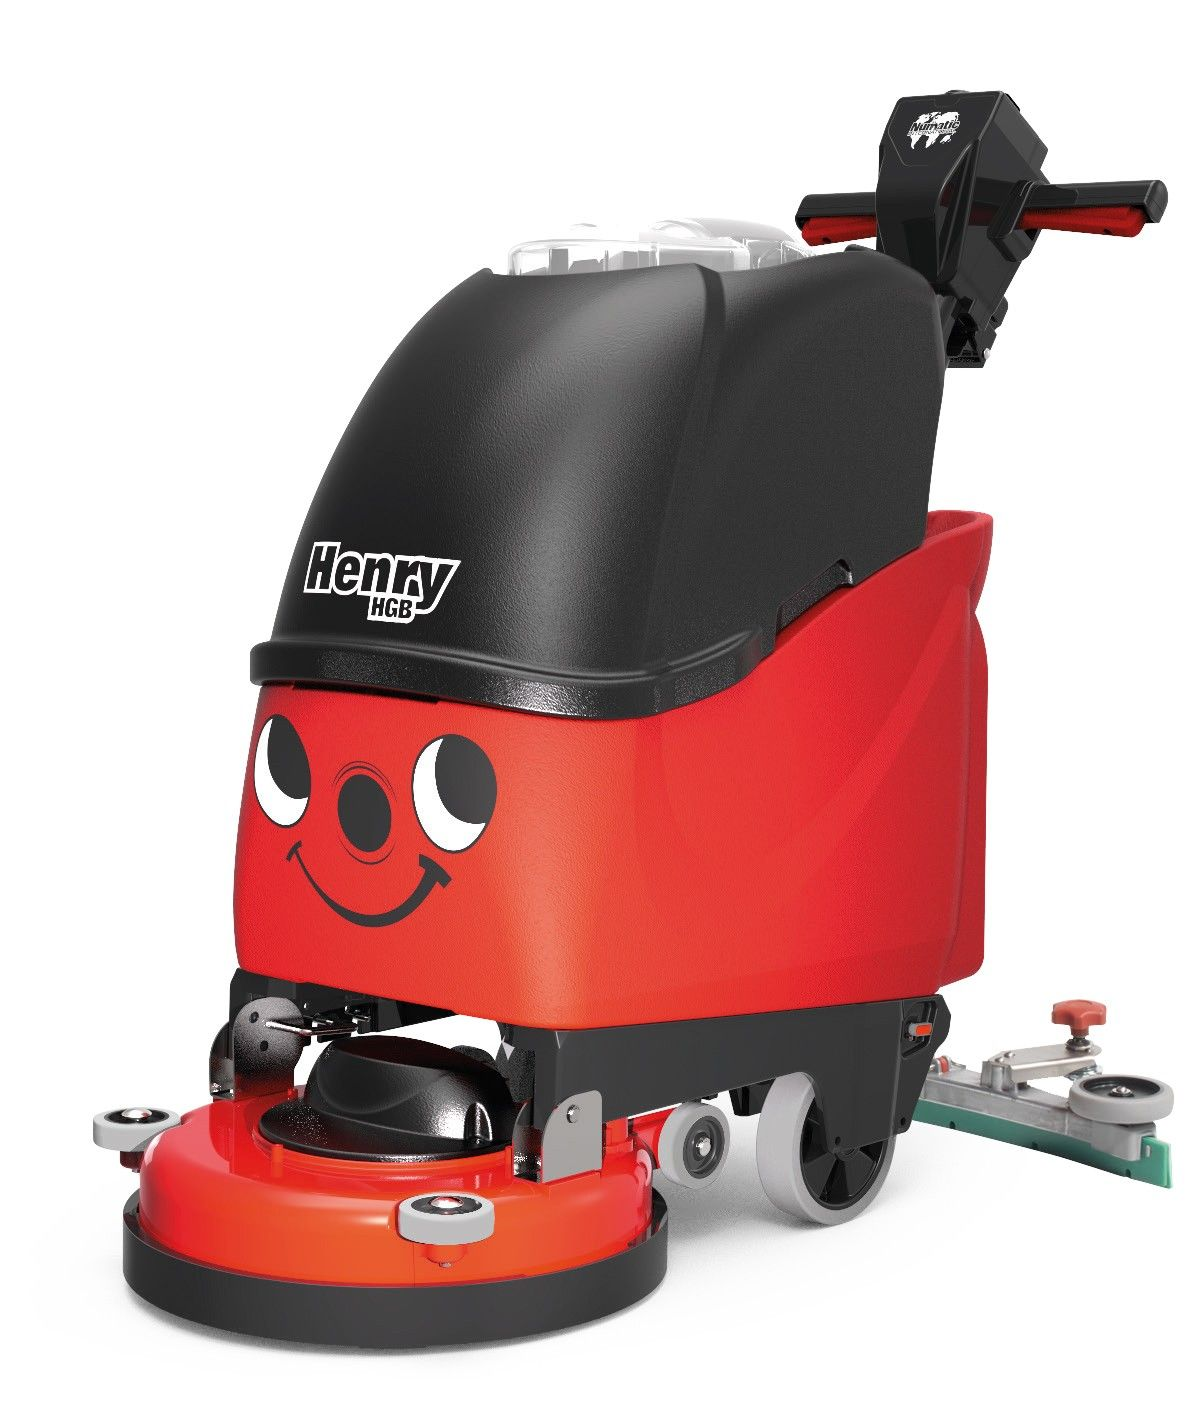 HGB3045 schrob-zuigmachine batterij Henry rood/zwart